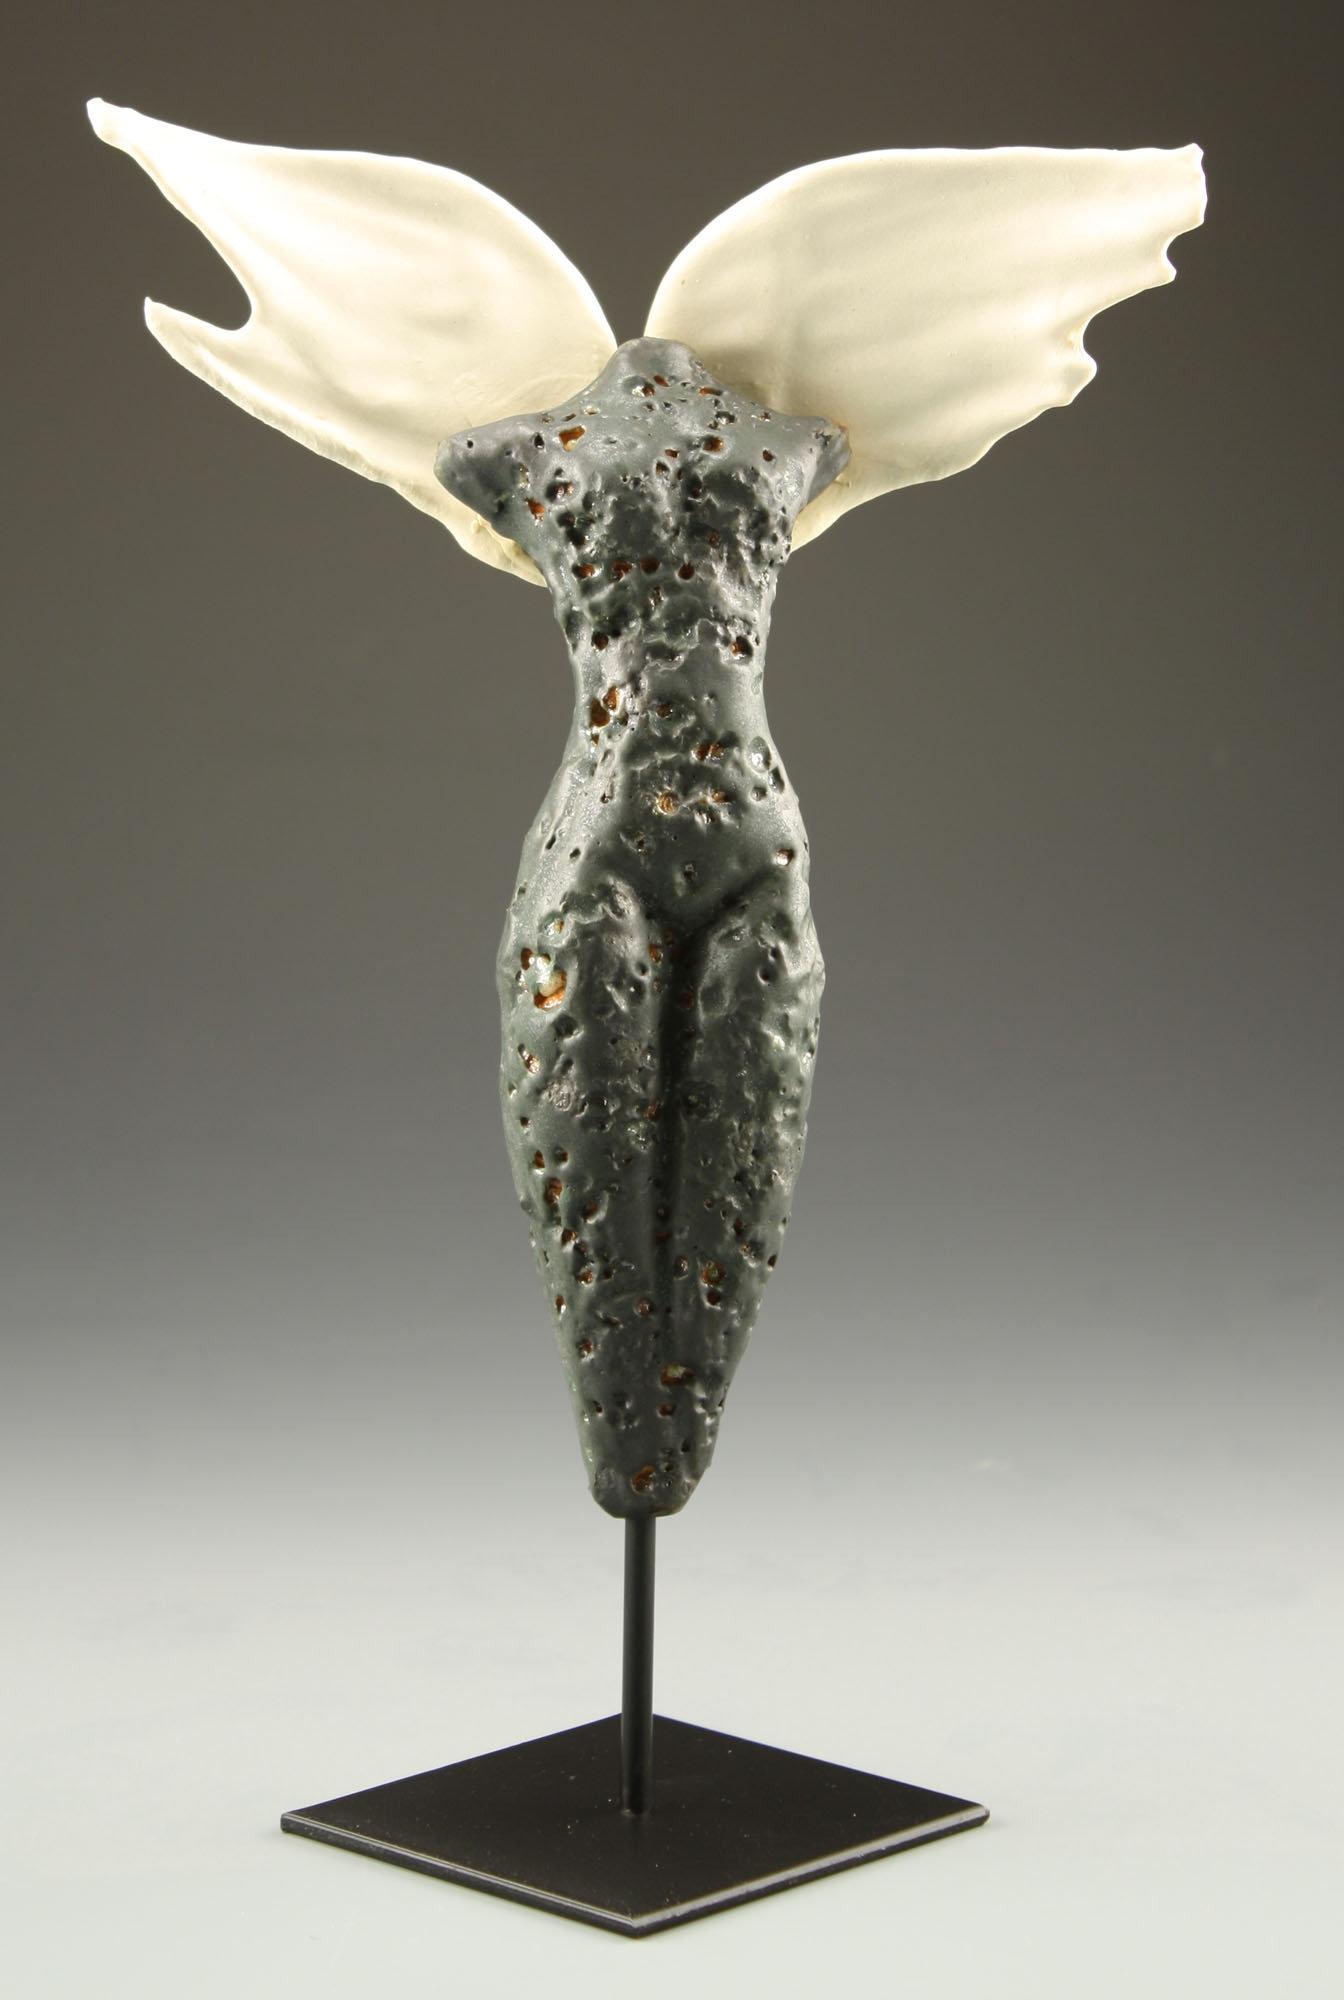 Transcendence: Black Winged Figure by Cathy Broski (Ceramic ...